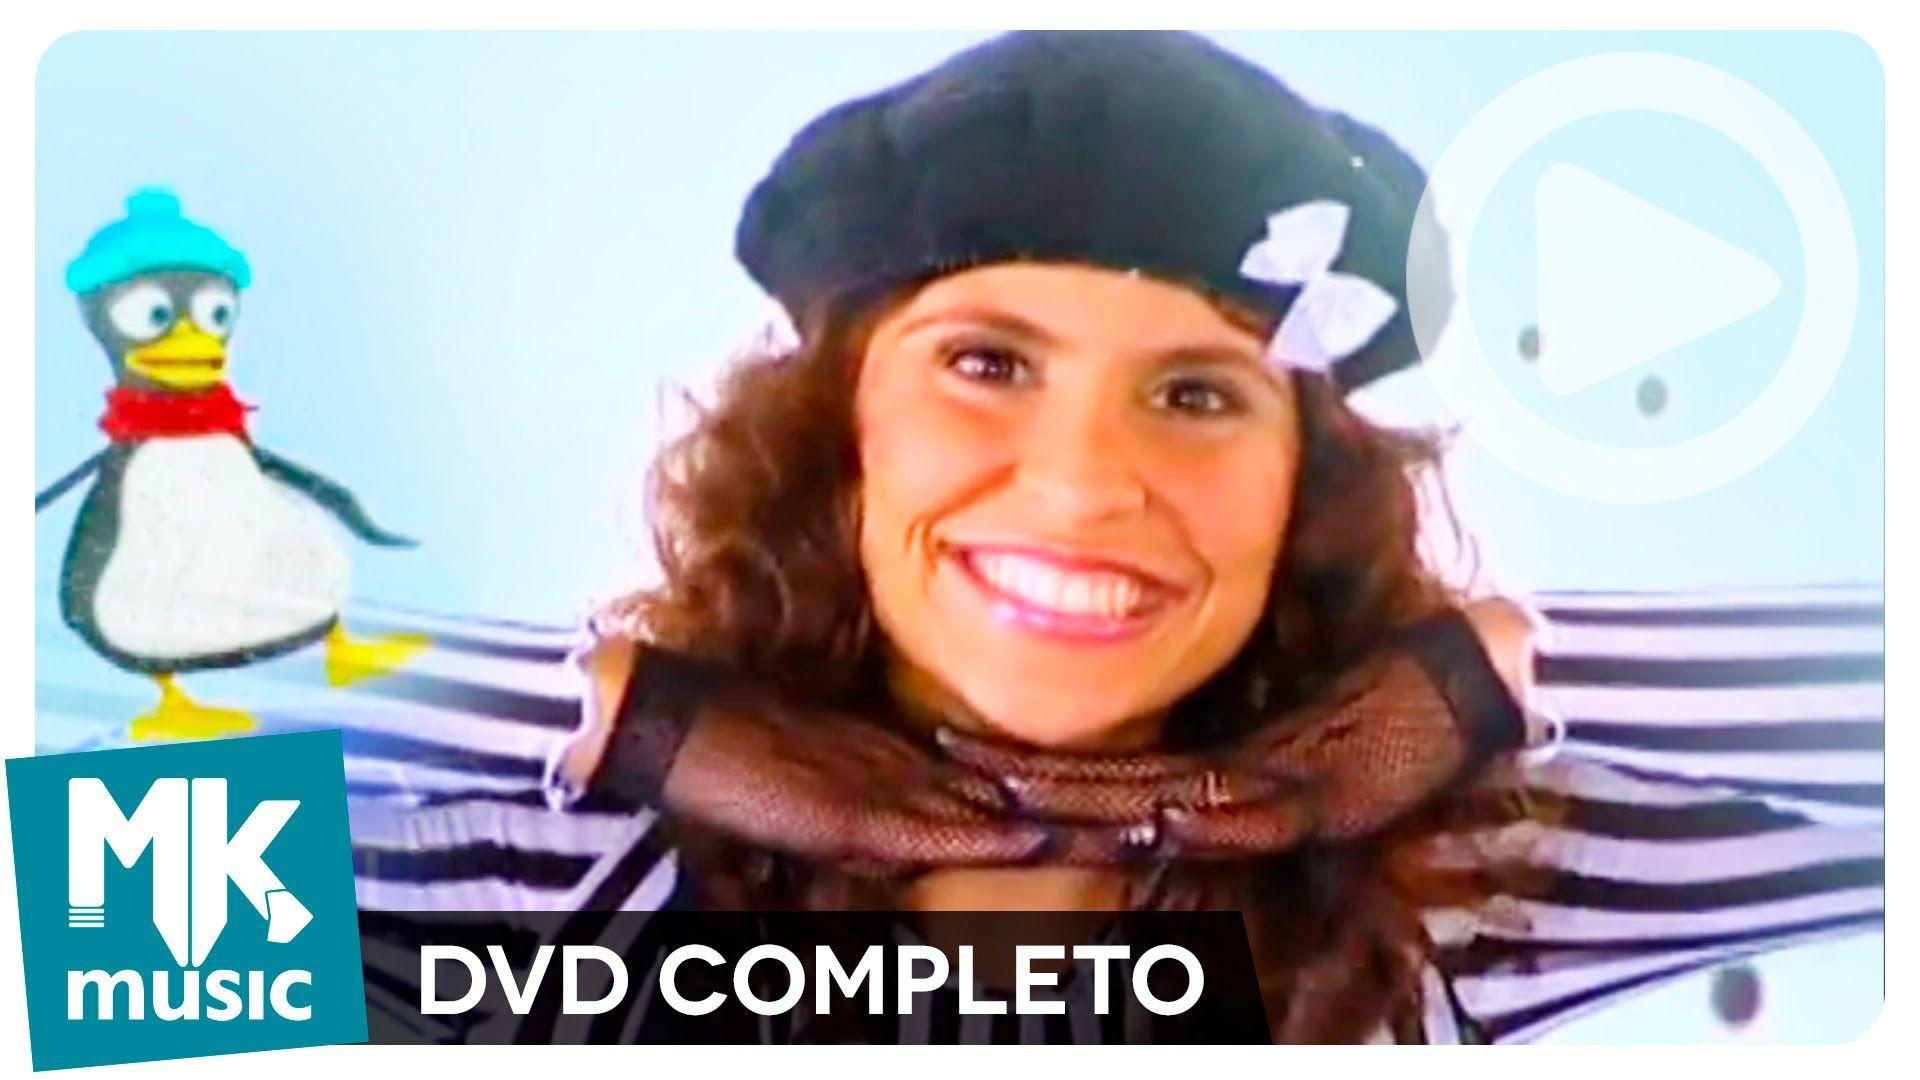 Aline Barros E Cia Dvd Completo Dvd Baixar Video Musica Para